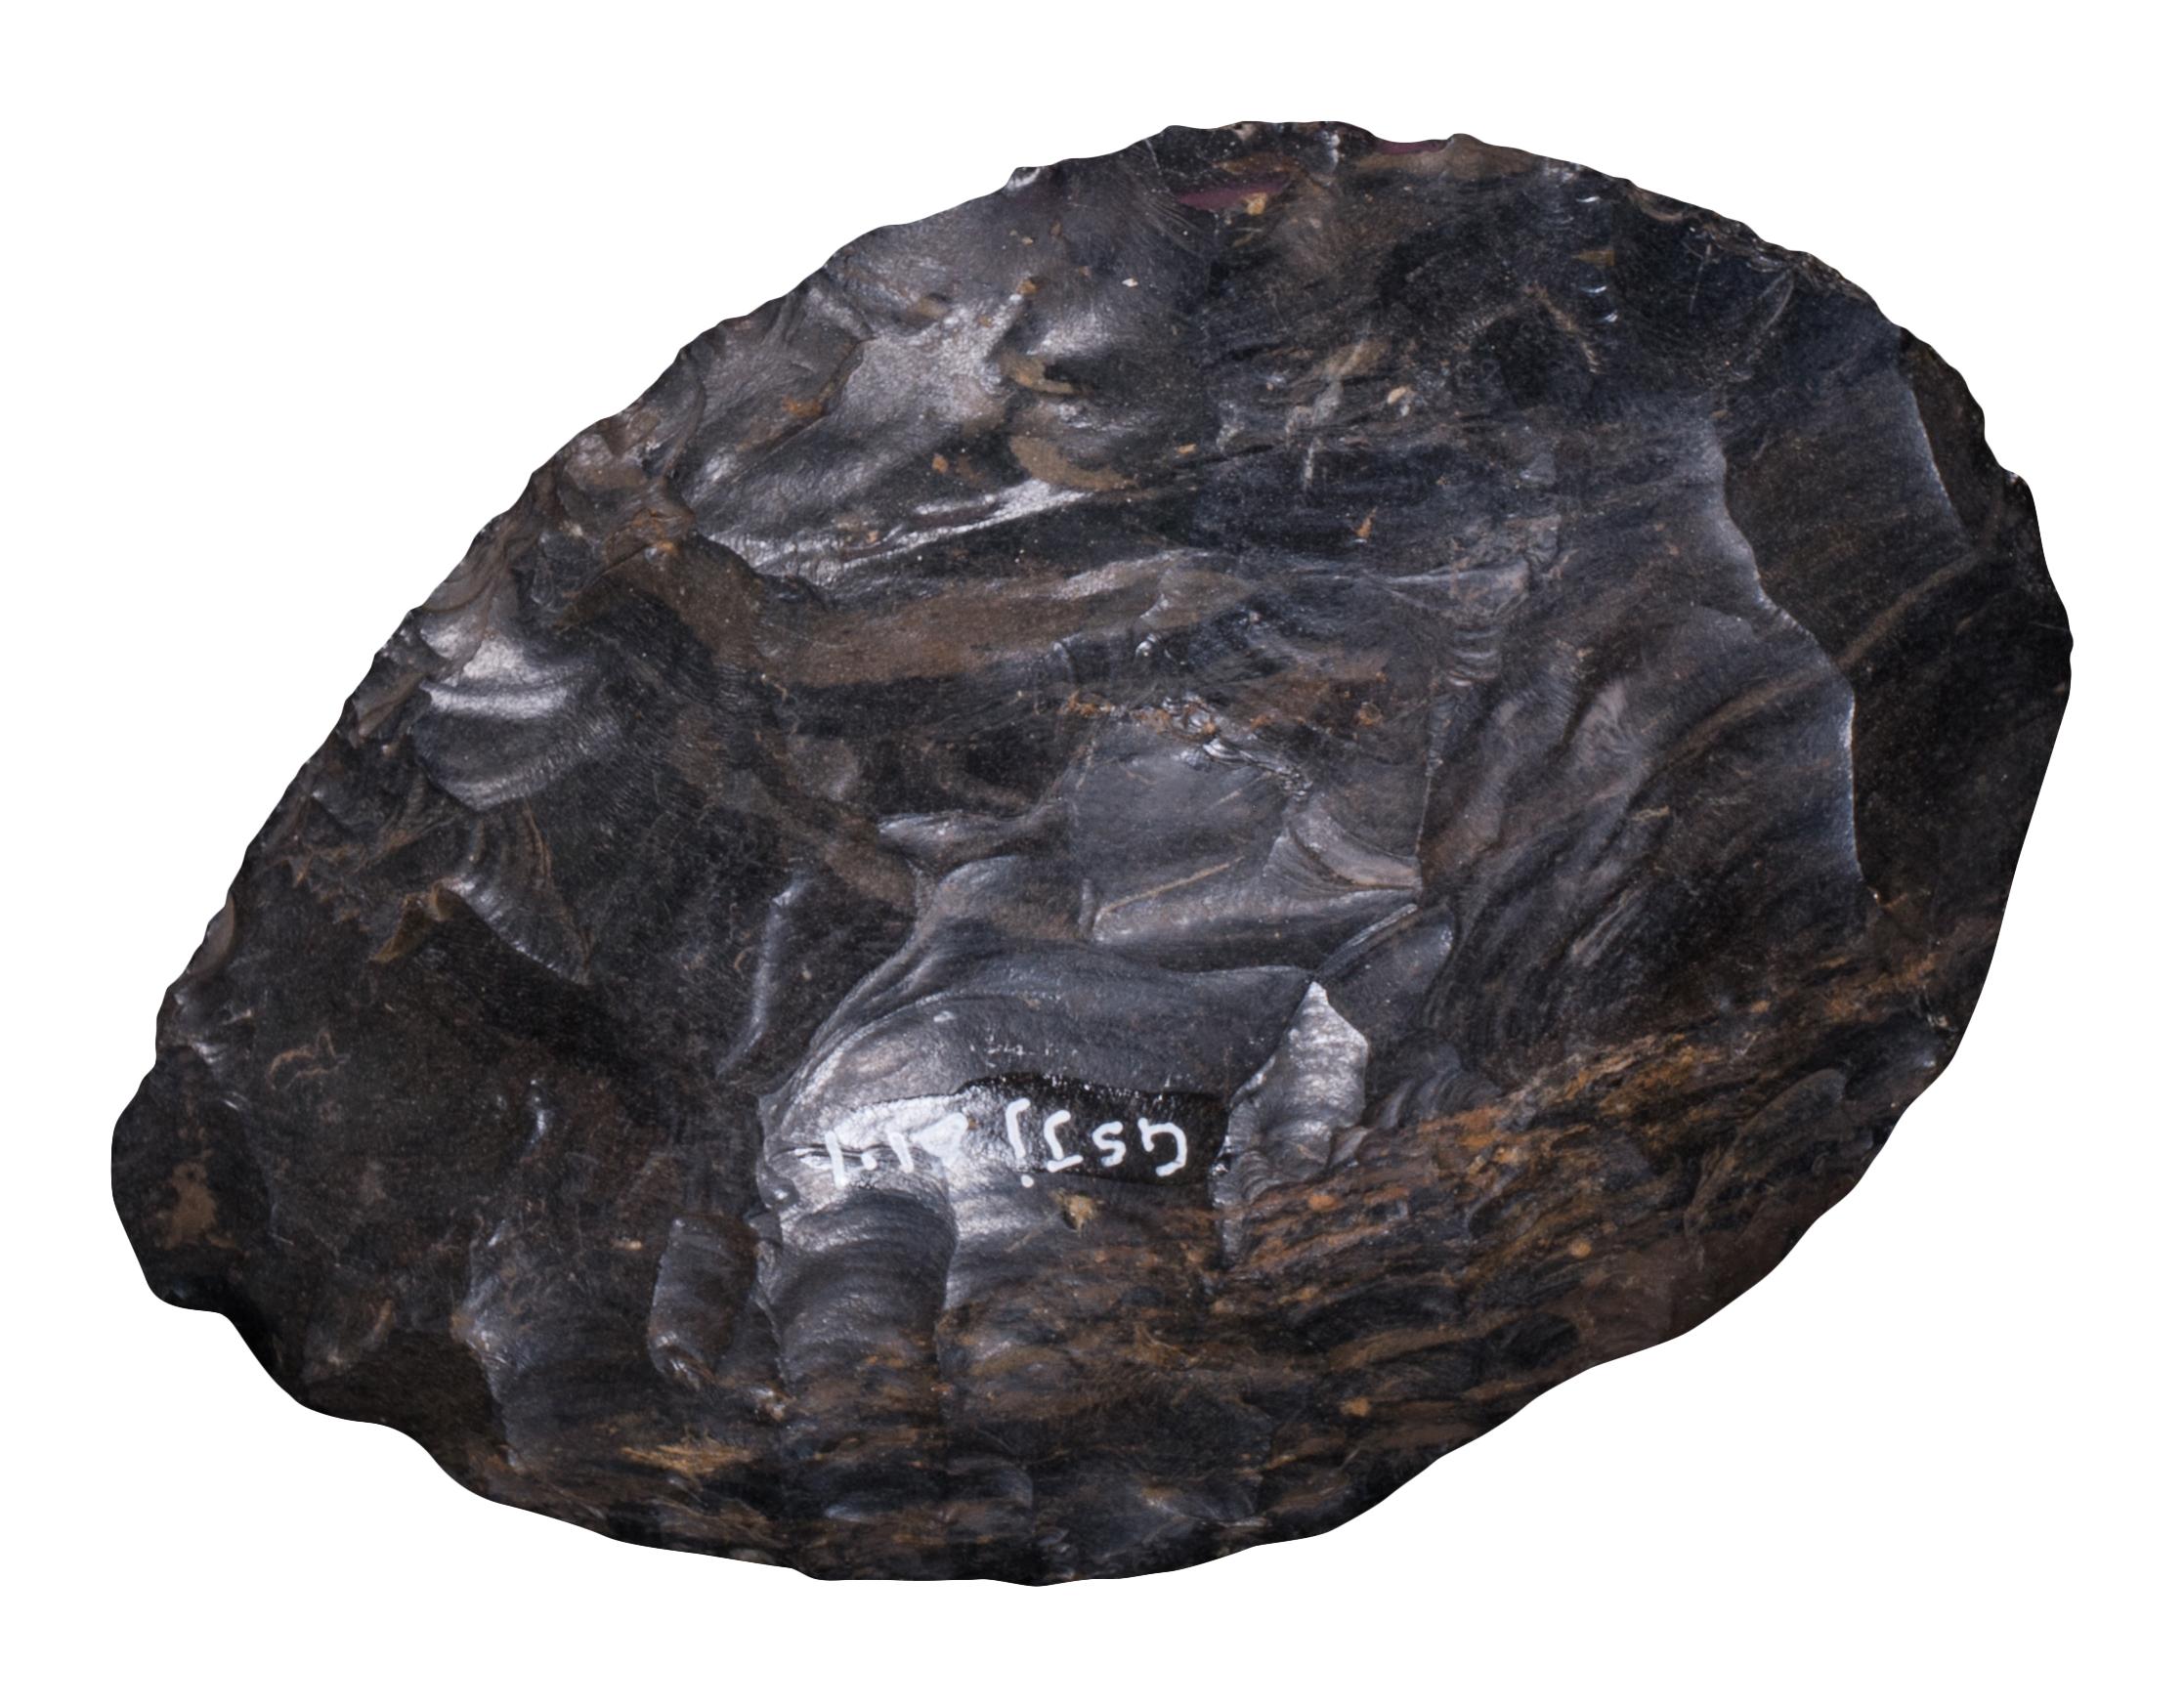 Obsidian - handaxe